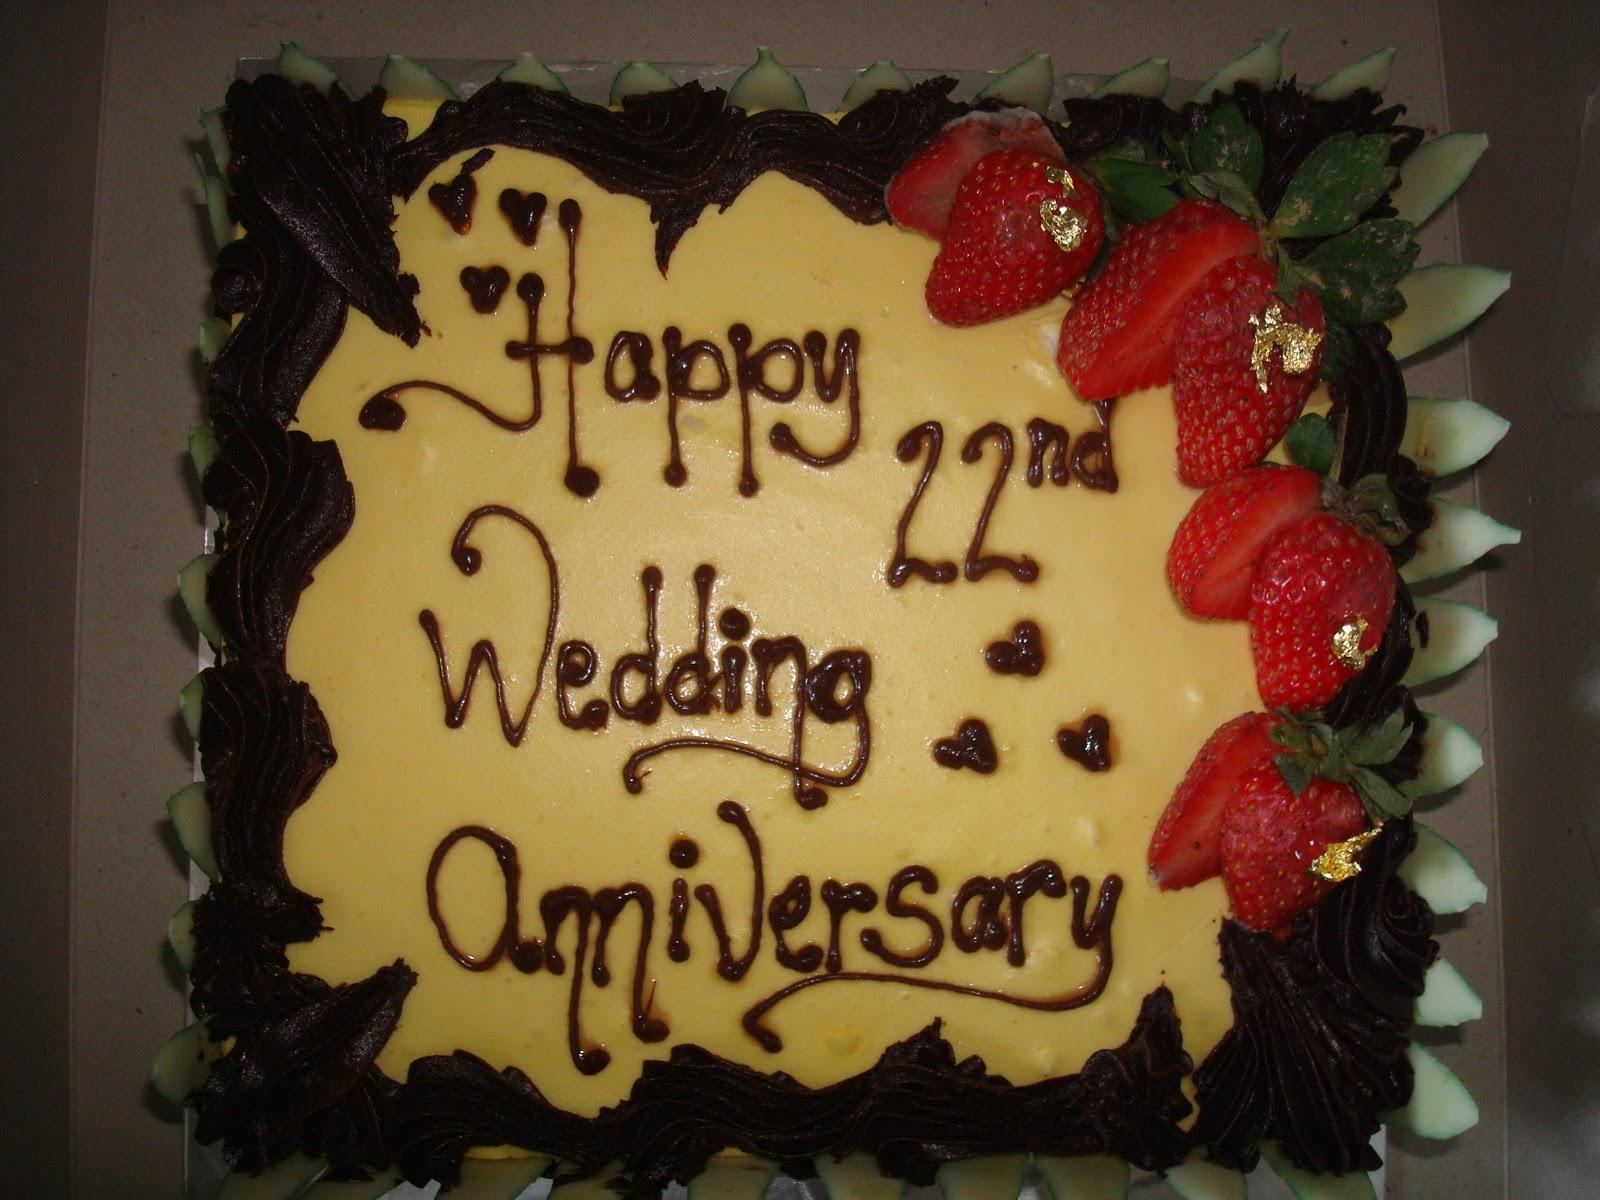 Re Happy Wedding Anniversary